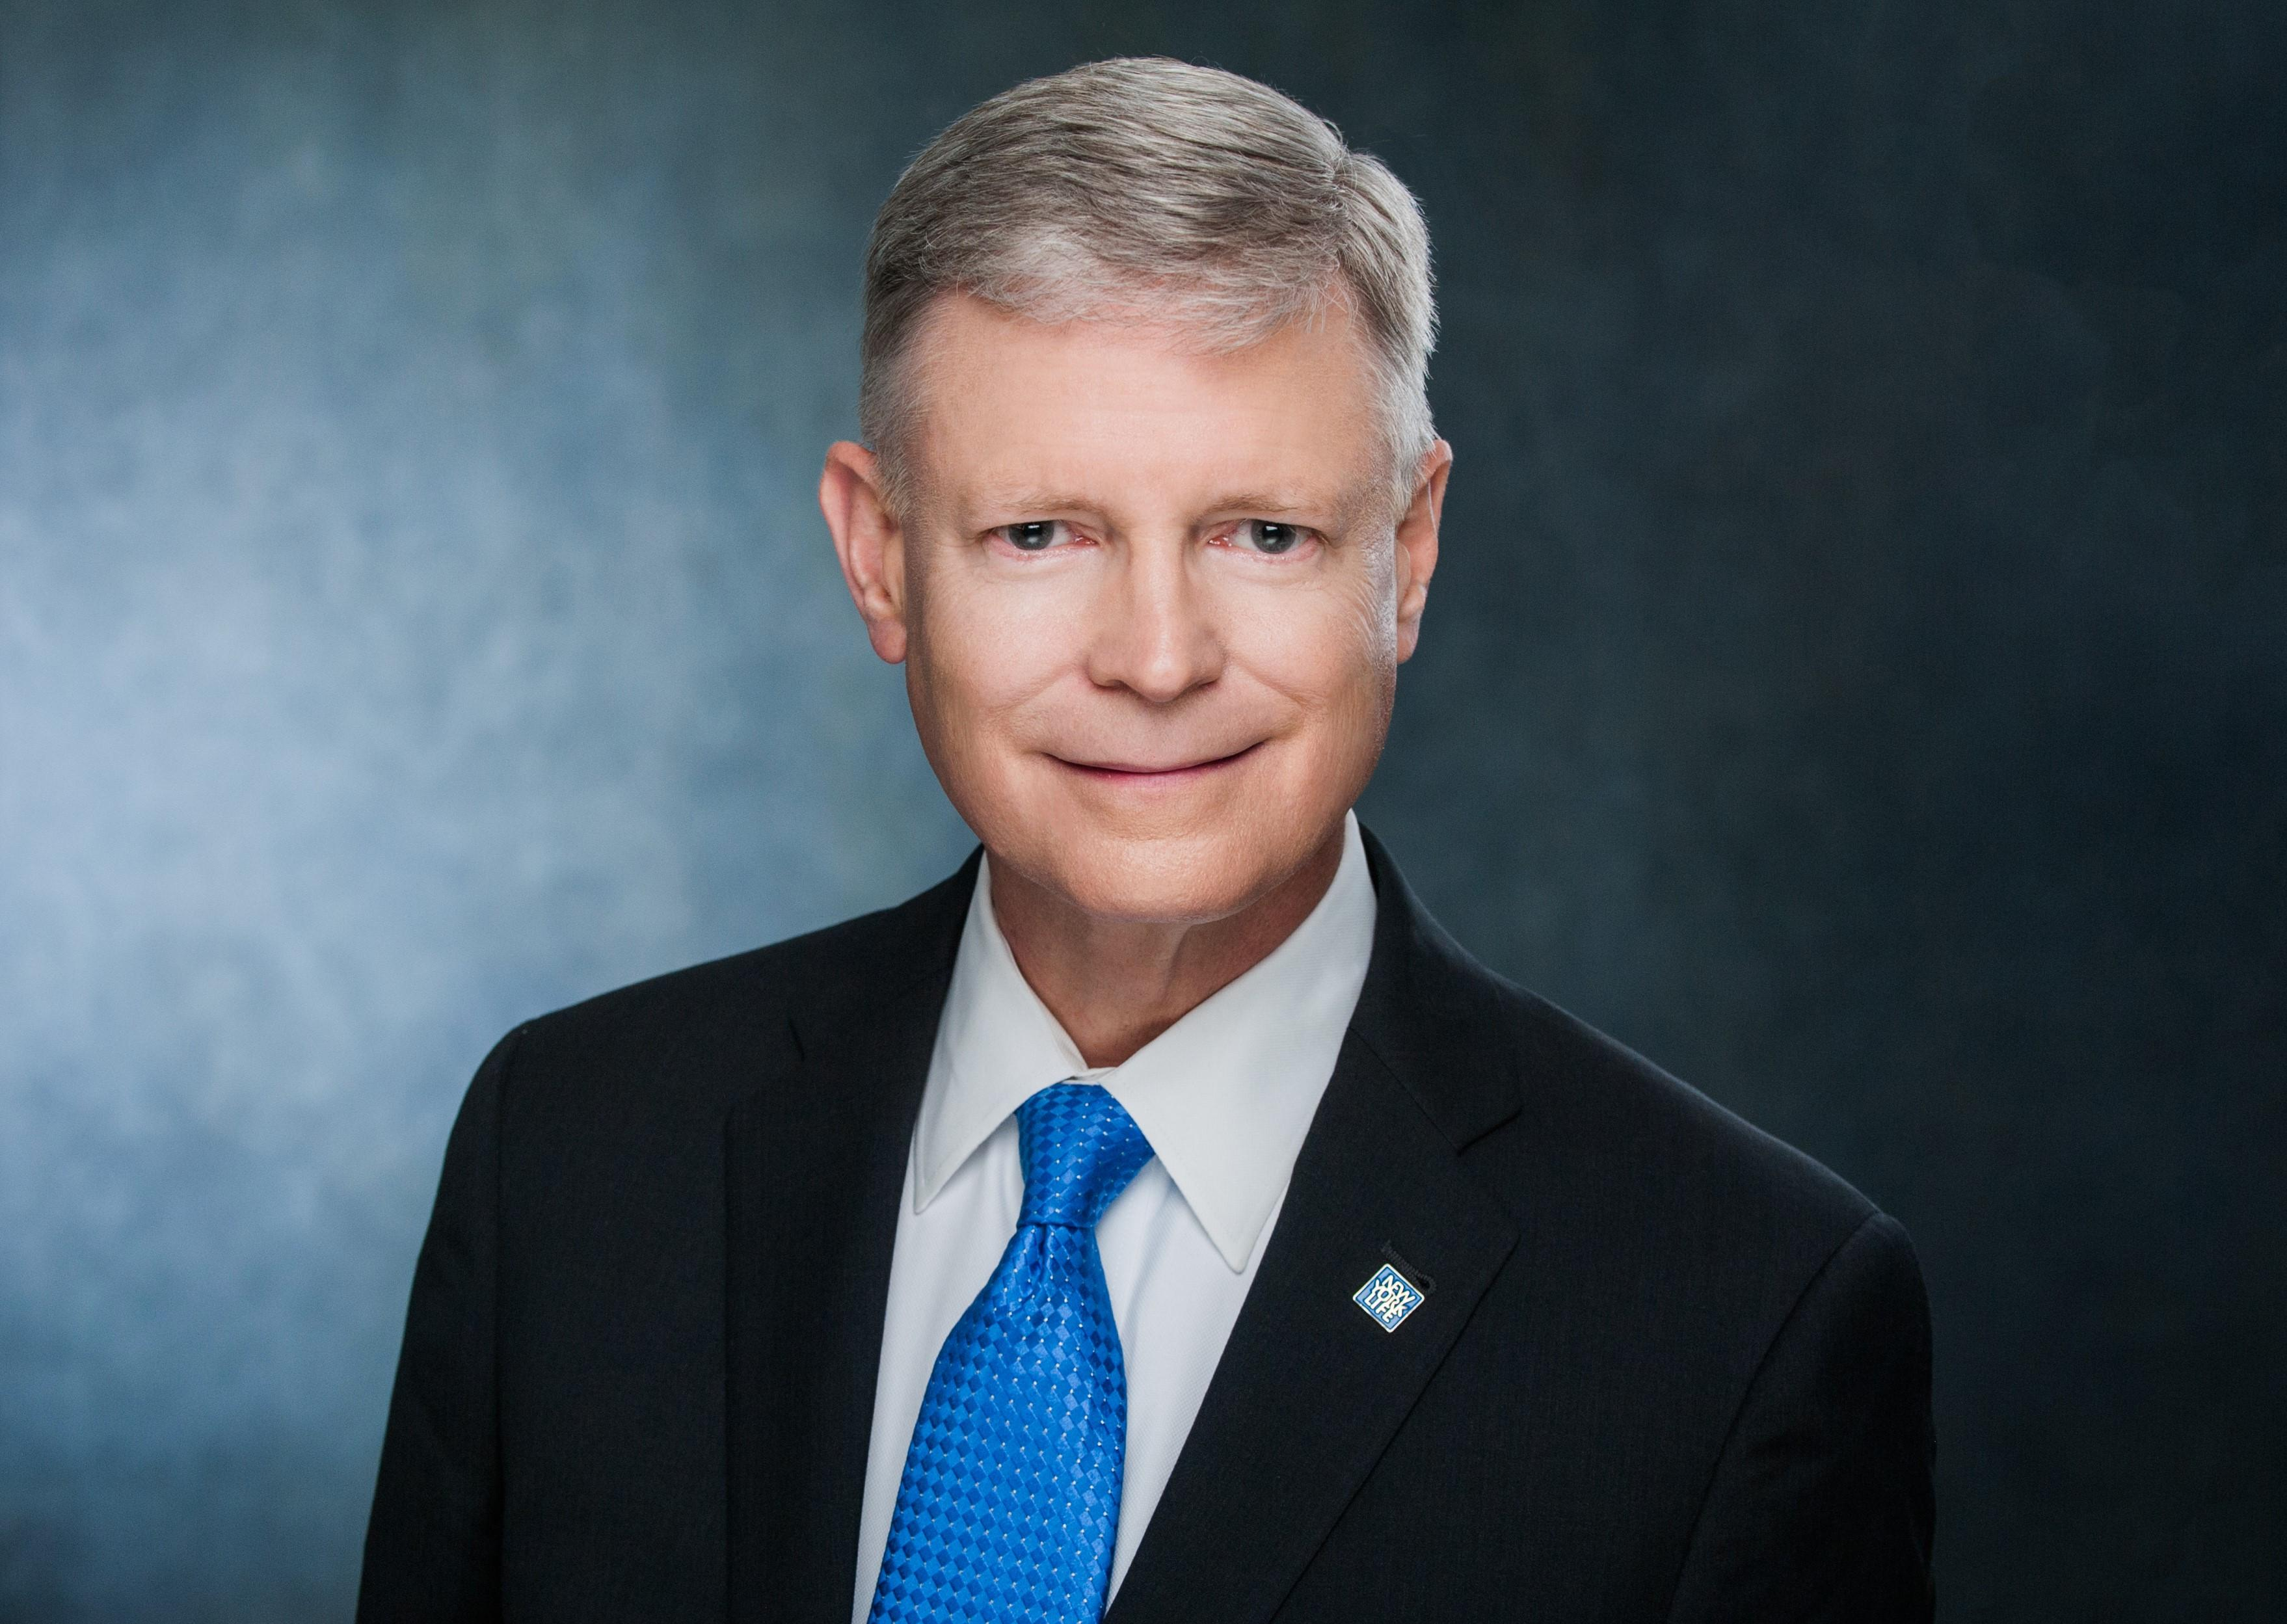 JOHN S. COATES Financial Professional & Insurance Agent